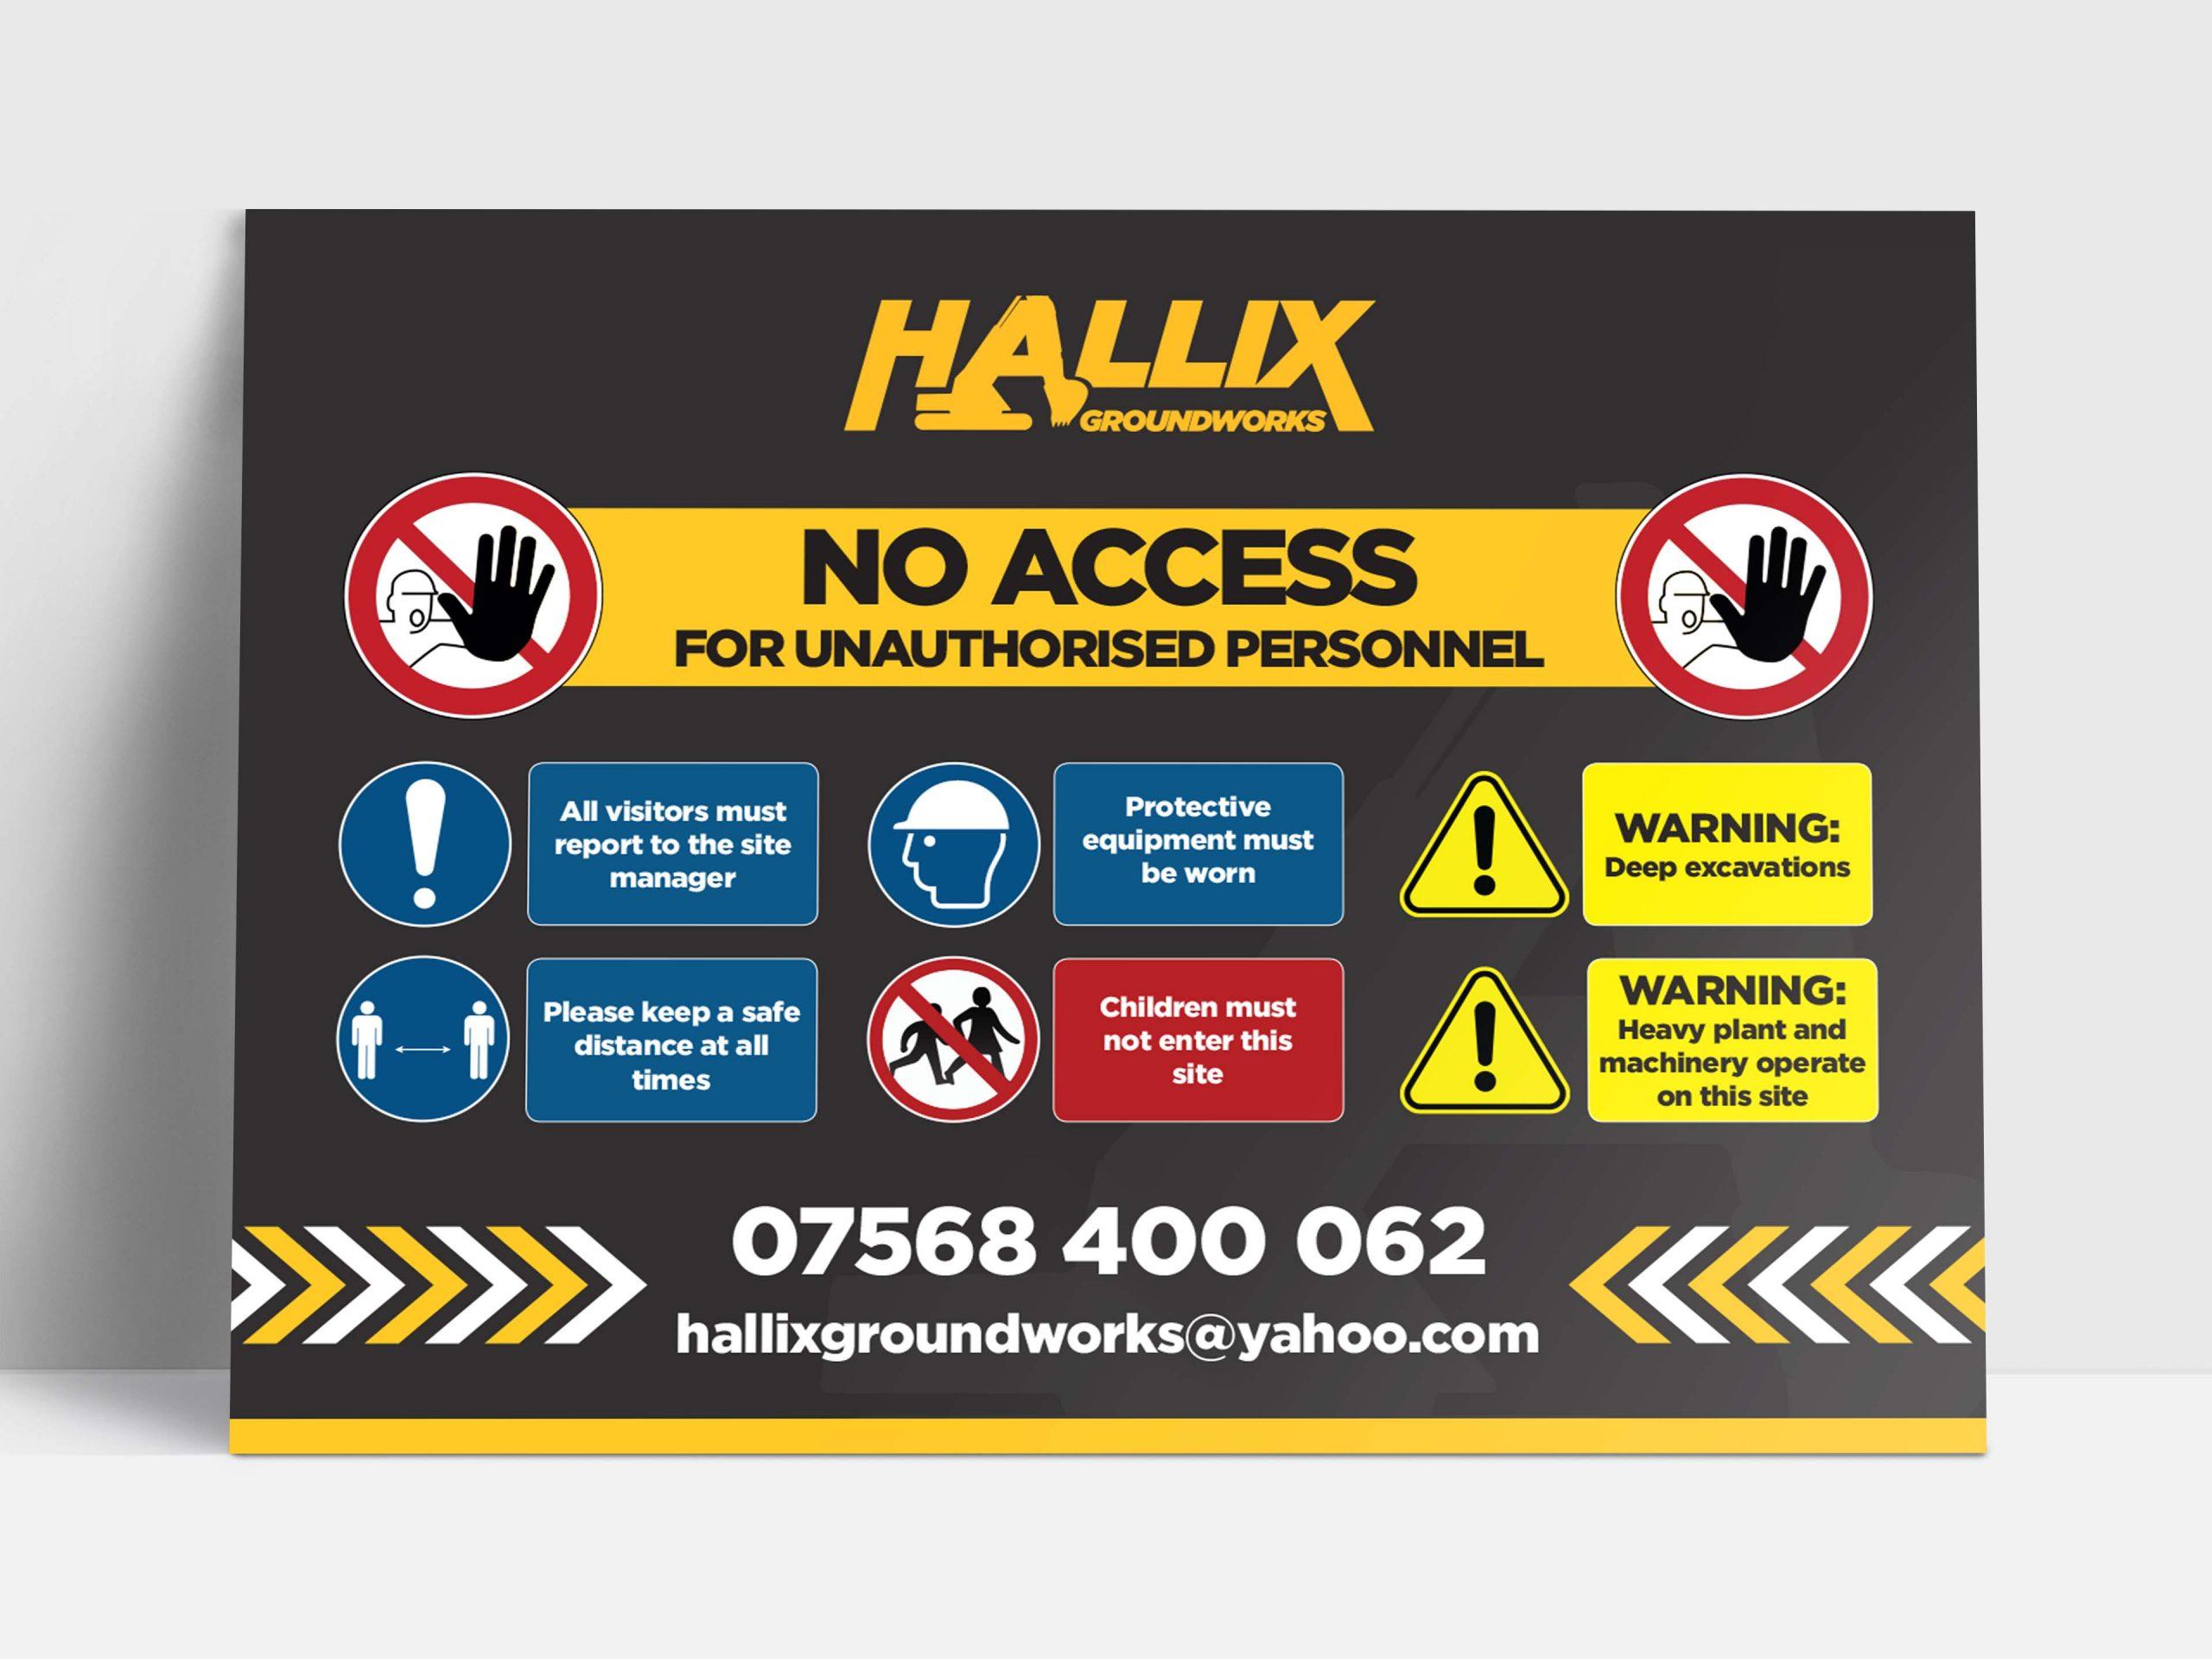 Hallix Groundworks Harrogate board design